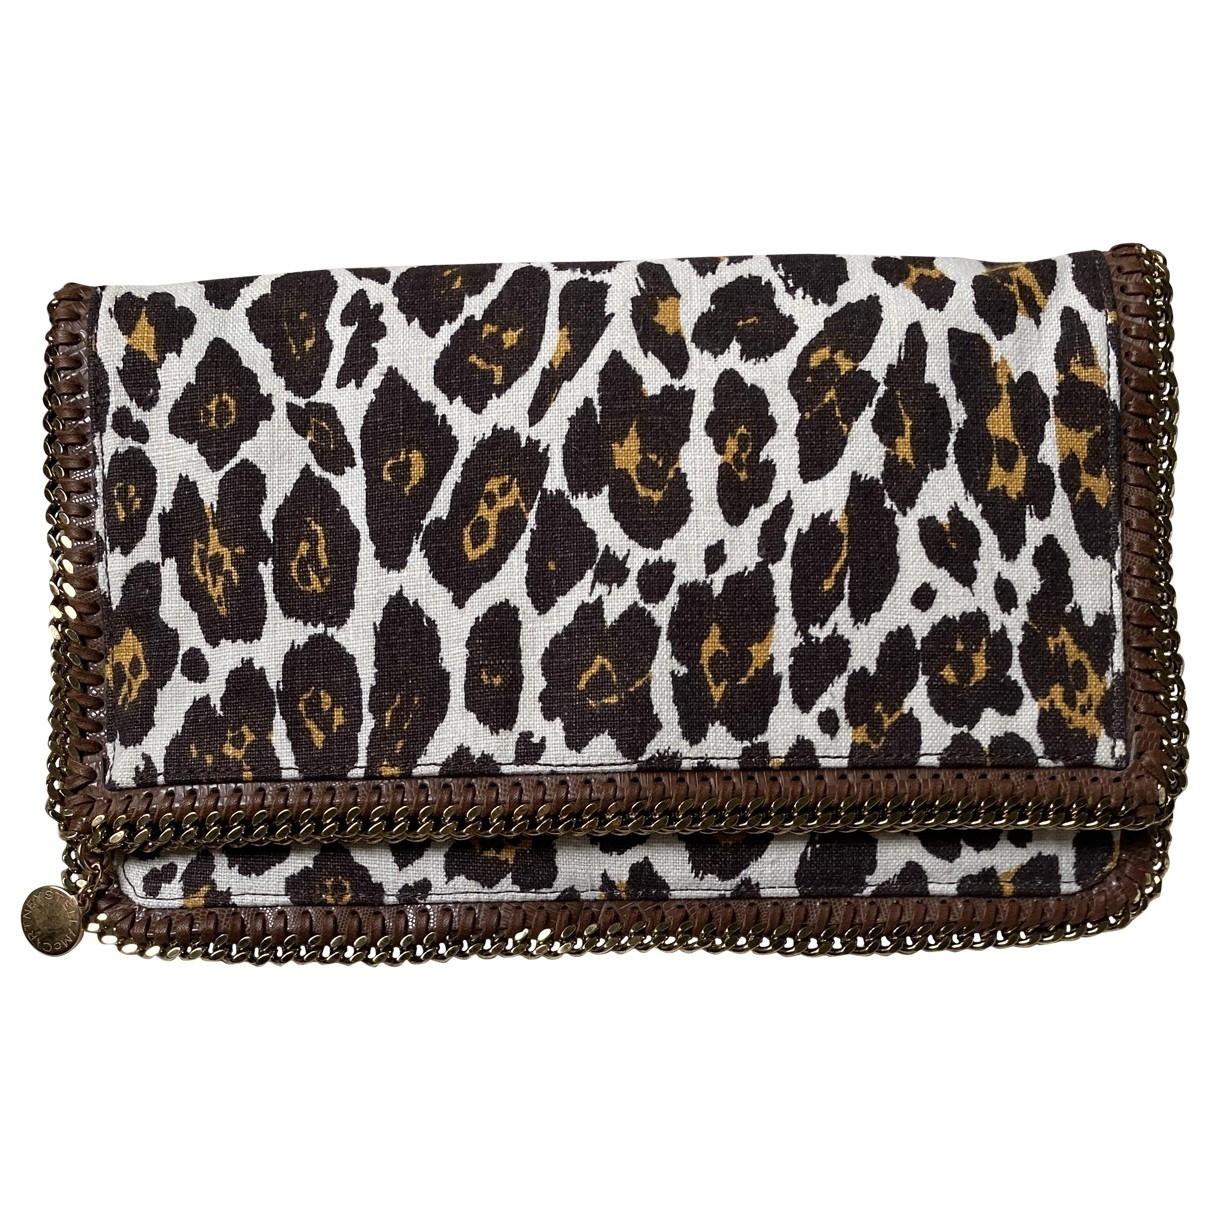 Stella Mccartney \N Linen Clutch bag for Women \N